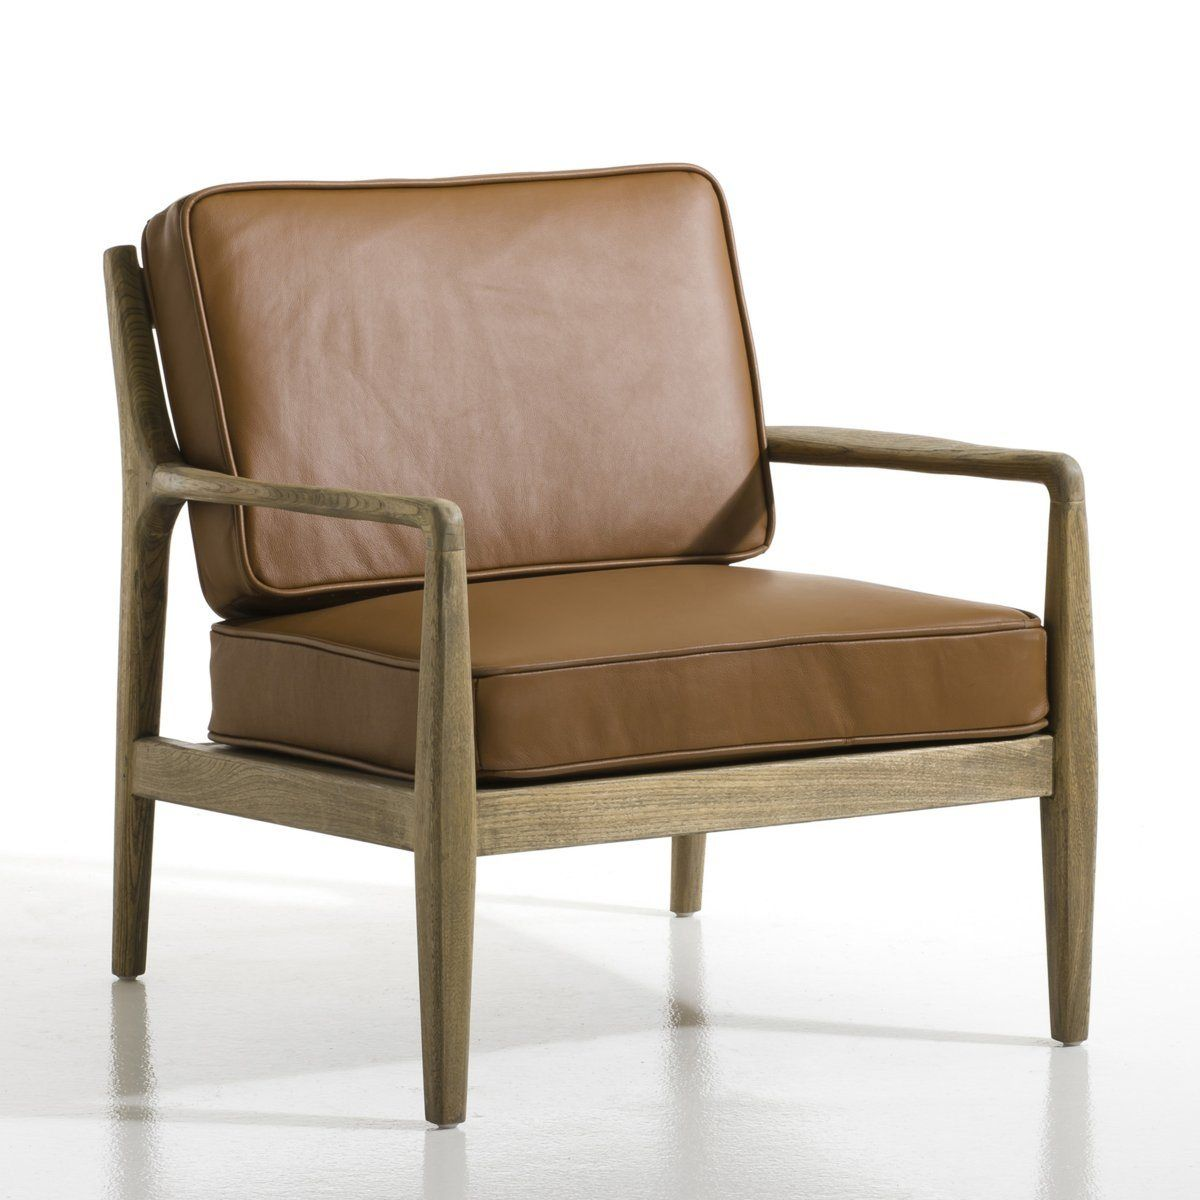 Fauteuil Dilma Cuir AmPm Bureau Pinterest Fauteuils Cuir Et - Petit fauteuil cuir design